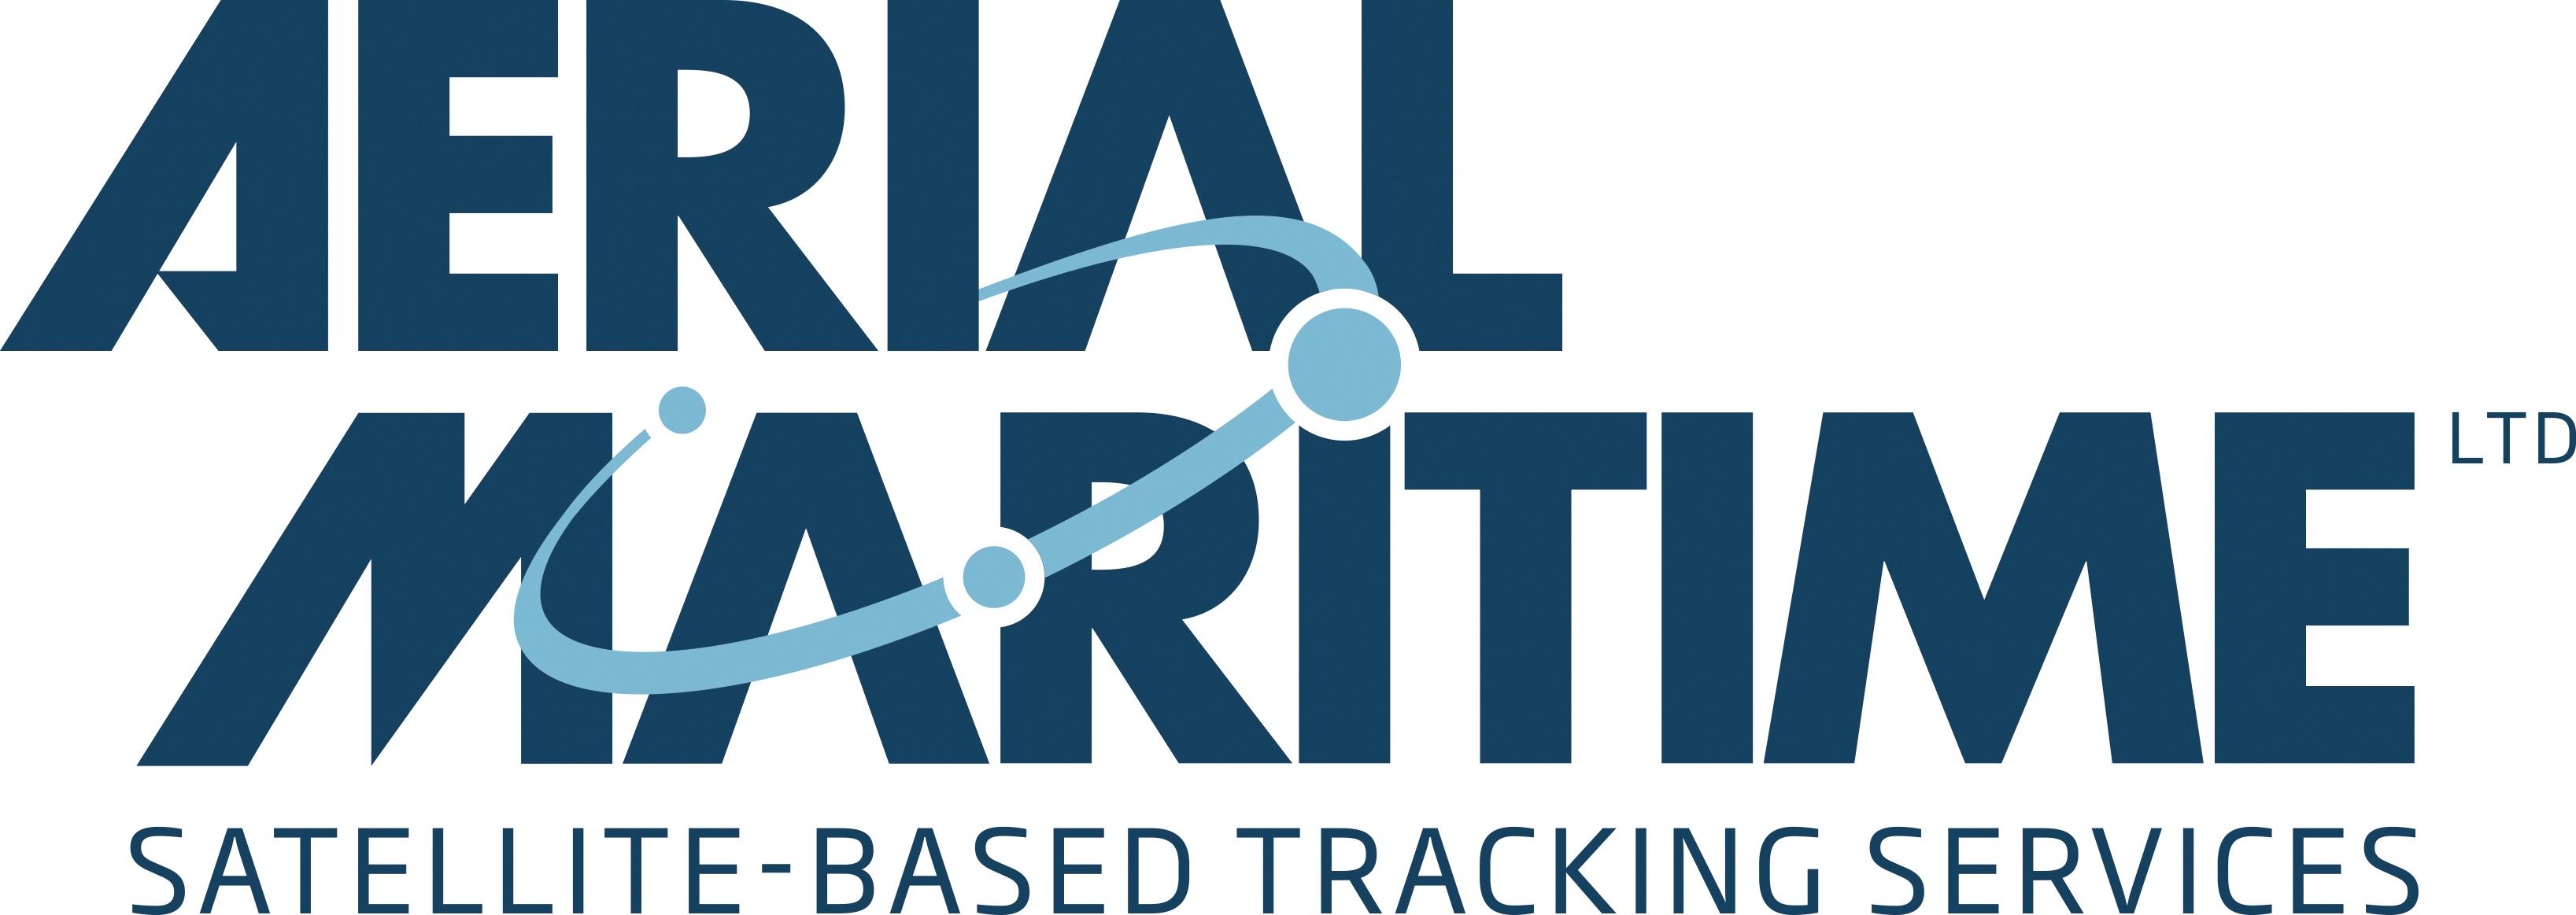 Aerial and Maritime Ltd. Logo